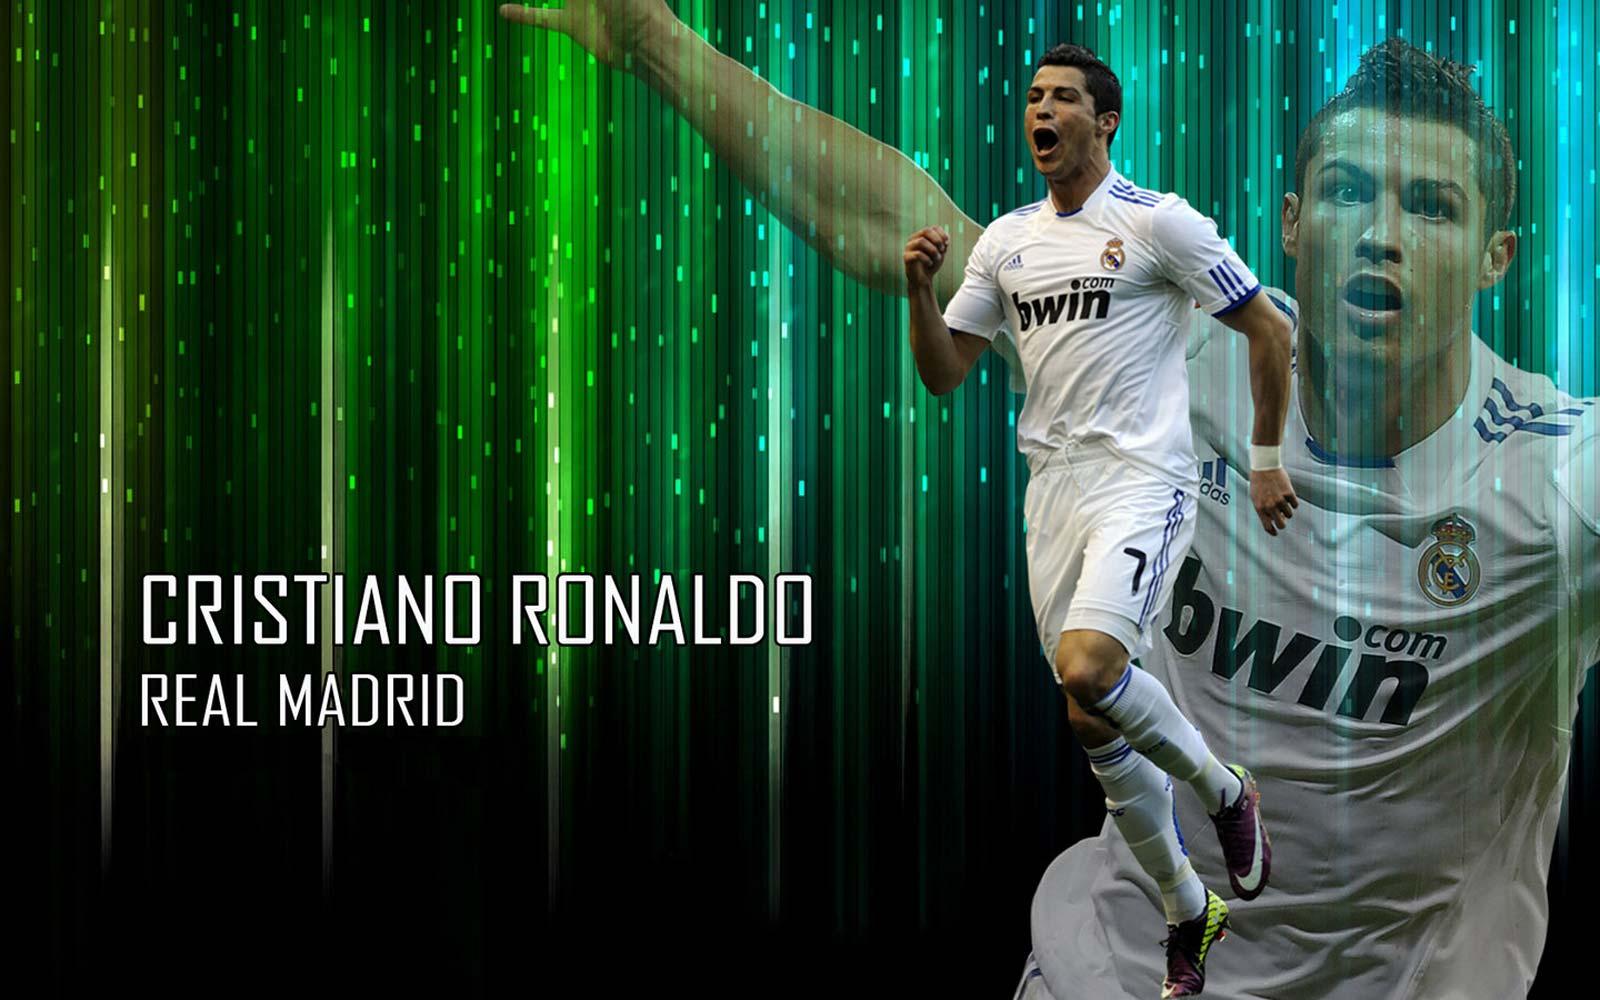 http://4.bp.blogspot.com/-qpuG9Z60aNQ/UDpQW1B87mI/AAAAAAAAAB8/7gYoCibG_M4/s1600/Cristiano+Ronaldo+new+wallpaper+2012-2013+12.jpg